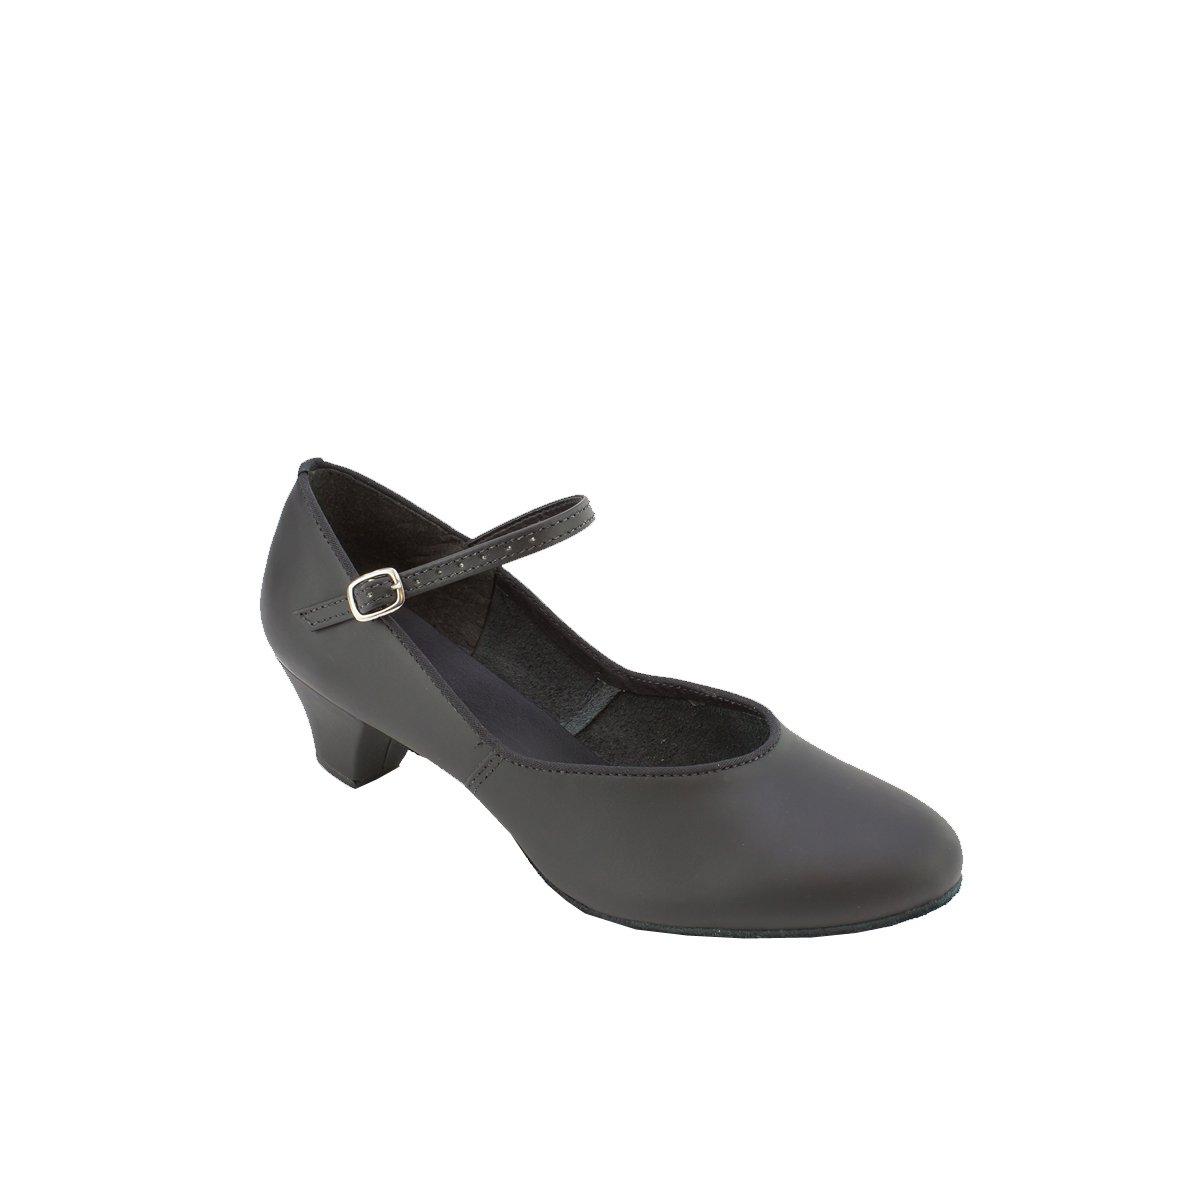 Sodanca Ch-02 Adult Candice 1.25 Flexible Shank Character Shoe